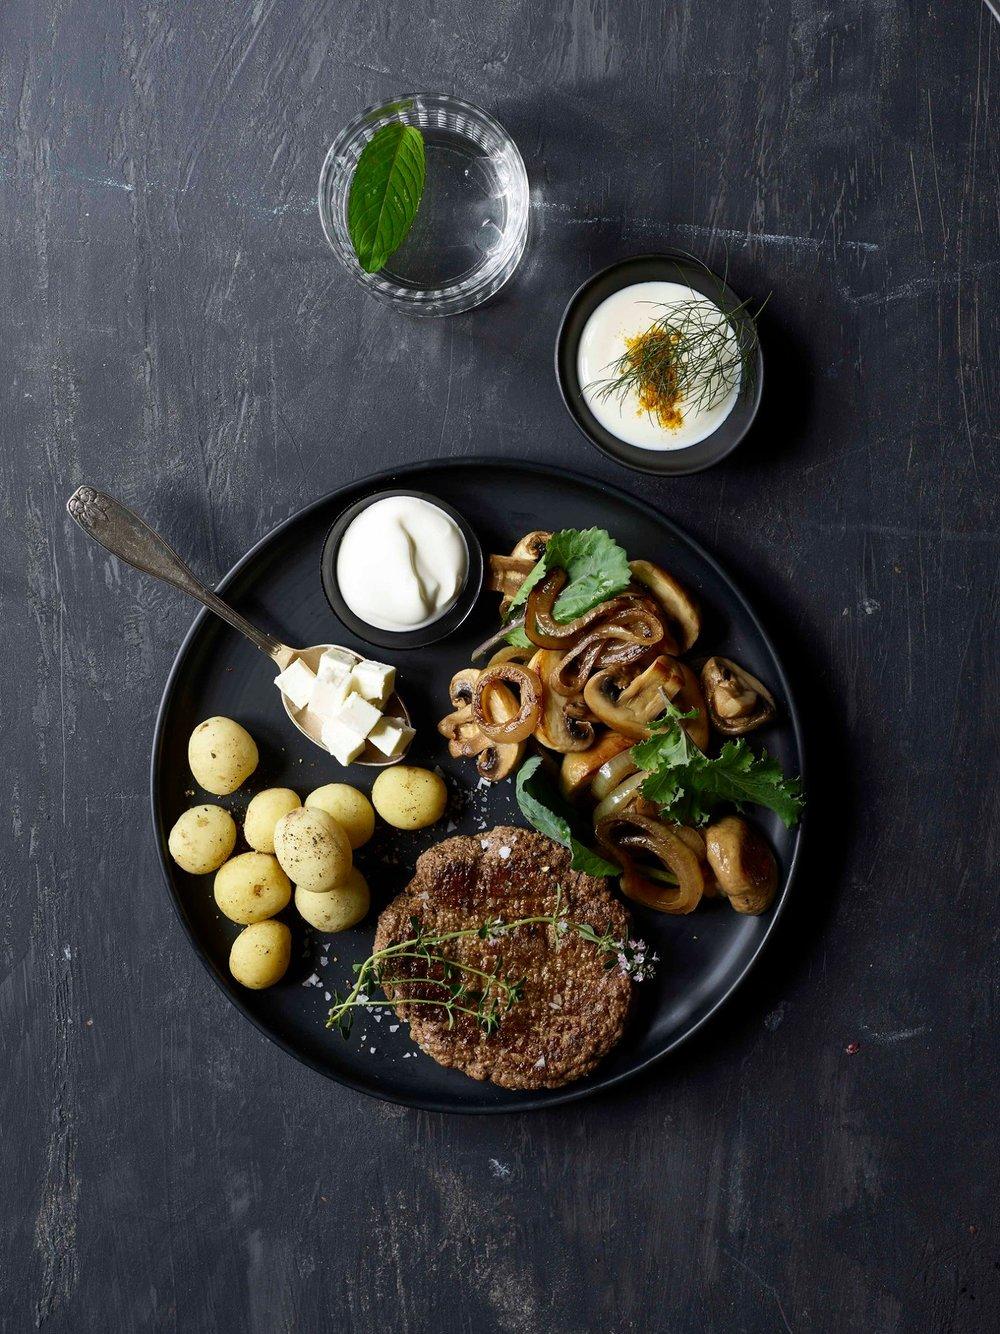 Hakkebøf med kartofler og løg. Hverdagsmad som vi alle kender og kan lide det.